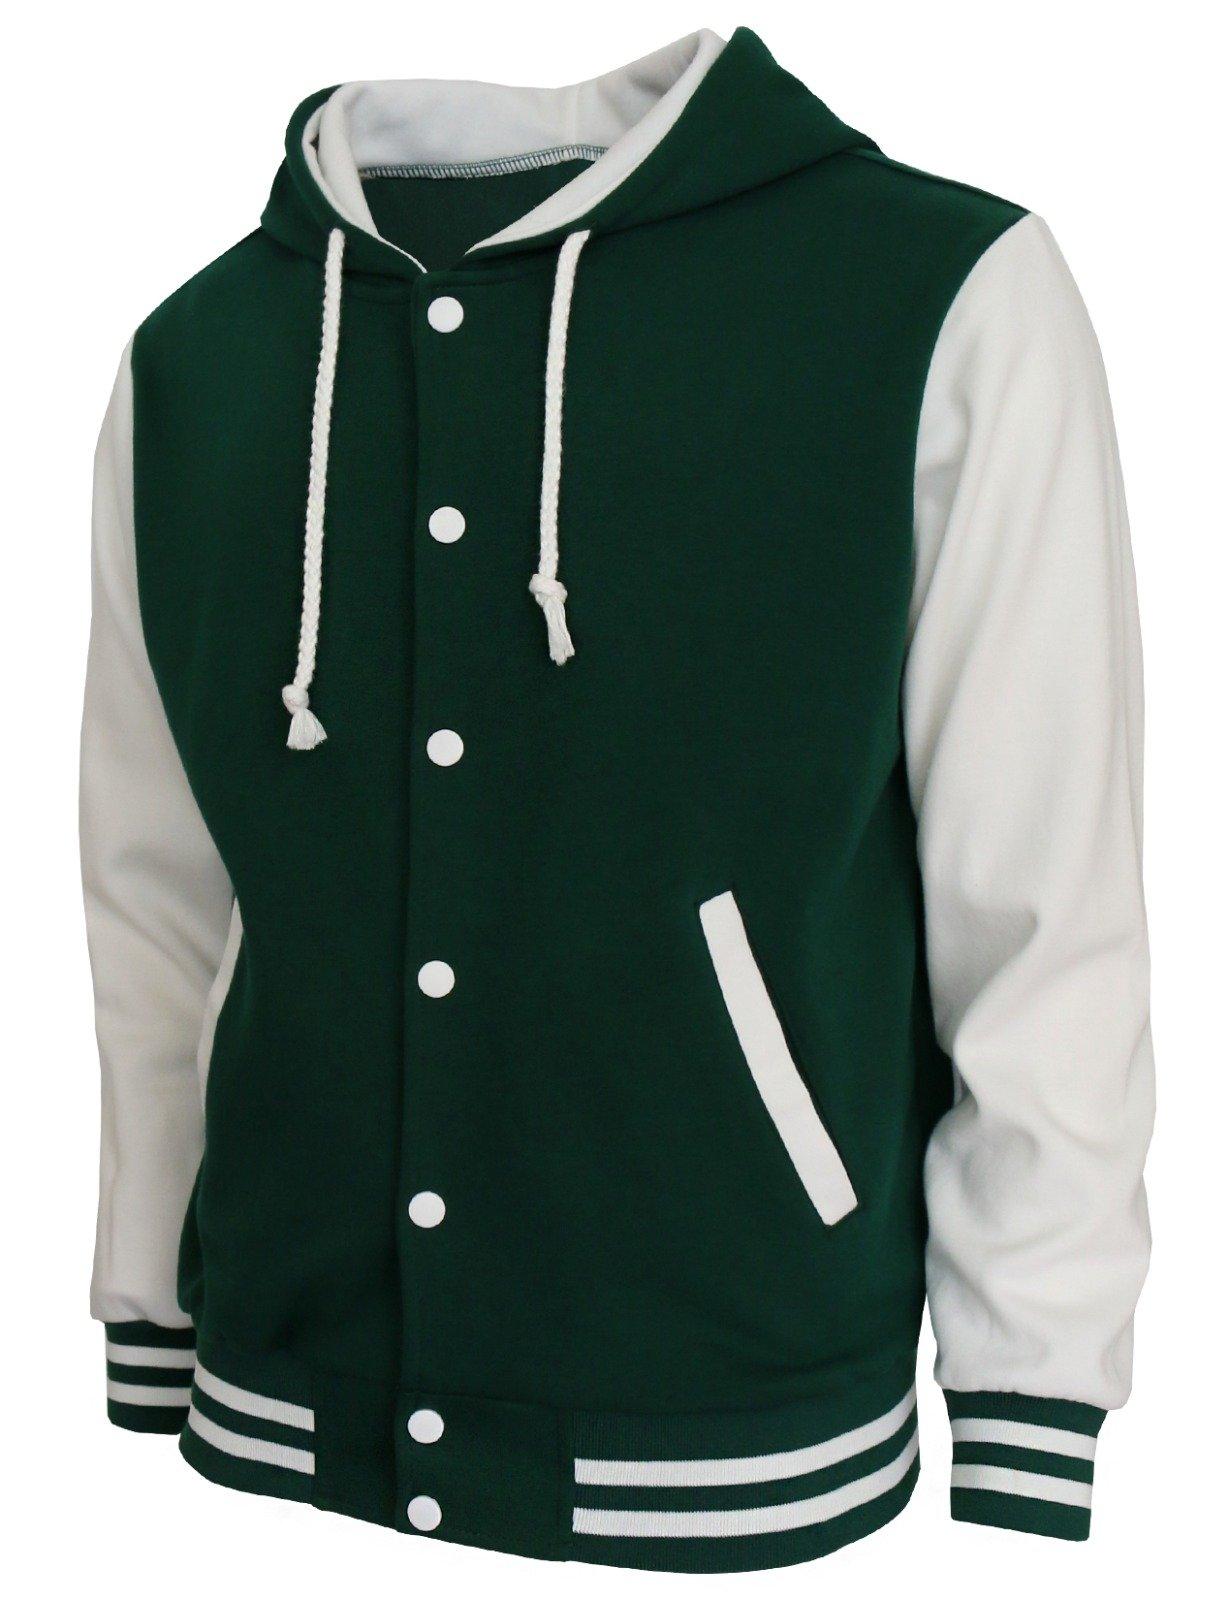 BCPOLO Hoodie Baseball Jacket Varsity Baseball Jacket Cotton Letterman Jacket Green-White-XL by BCPOLO